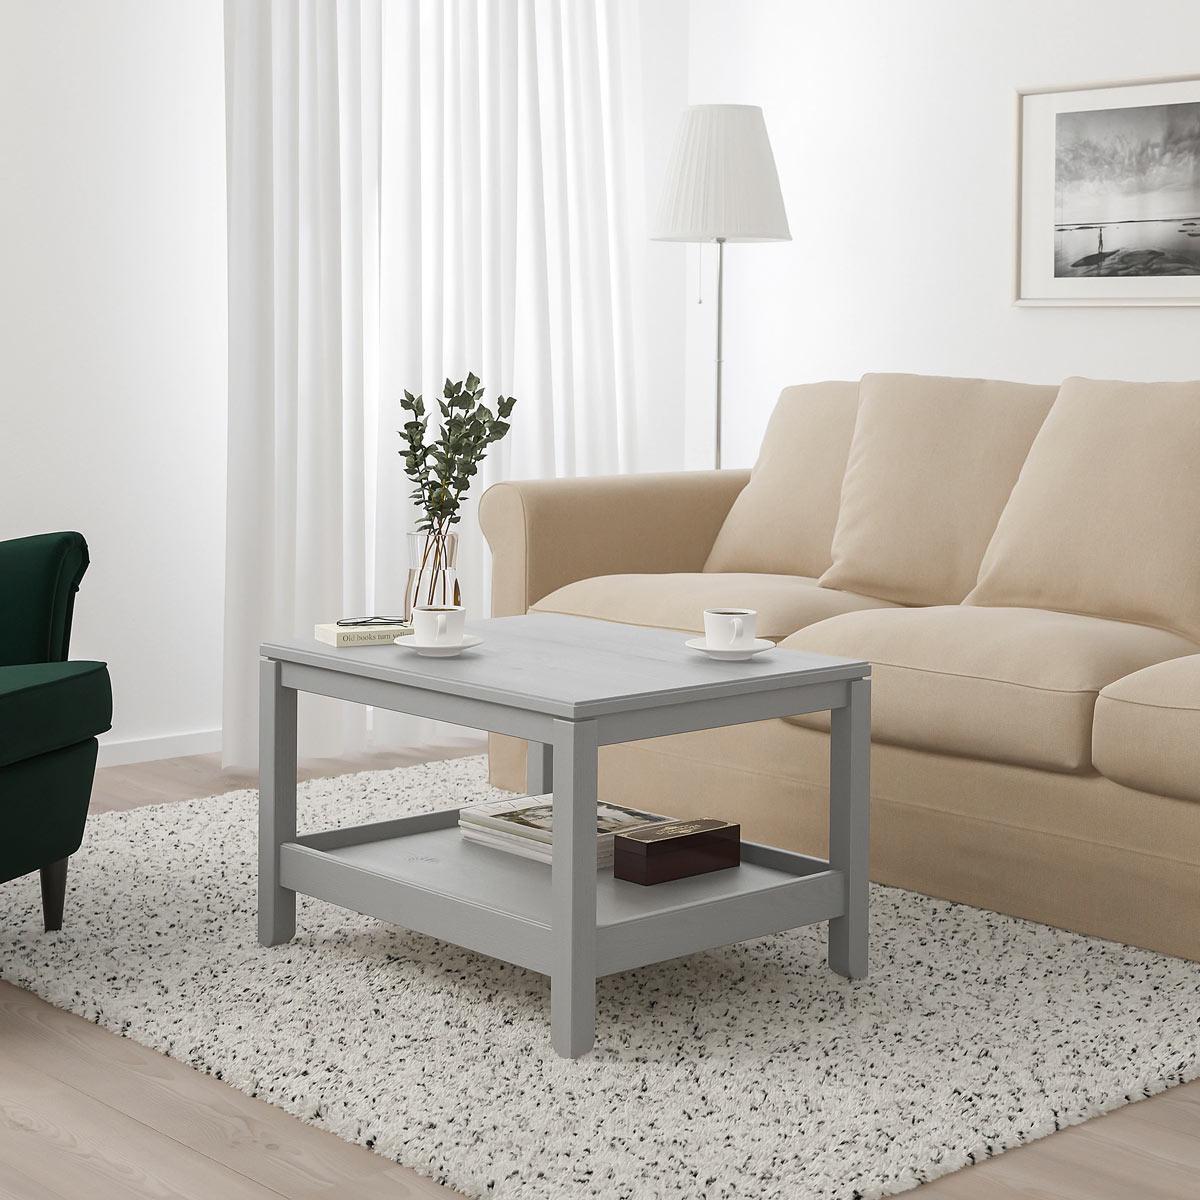 Offerta IKEA family giugno 2020, tavolo HAVSTA.